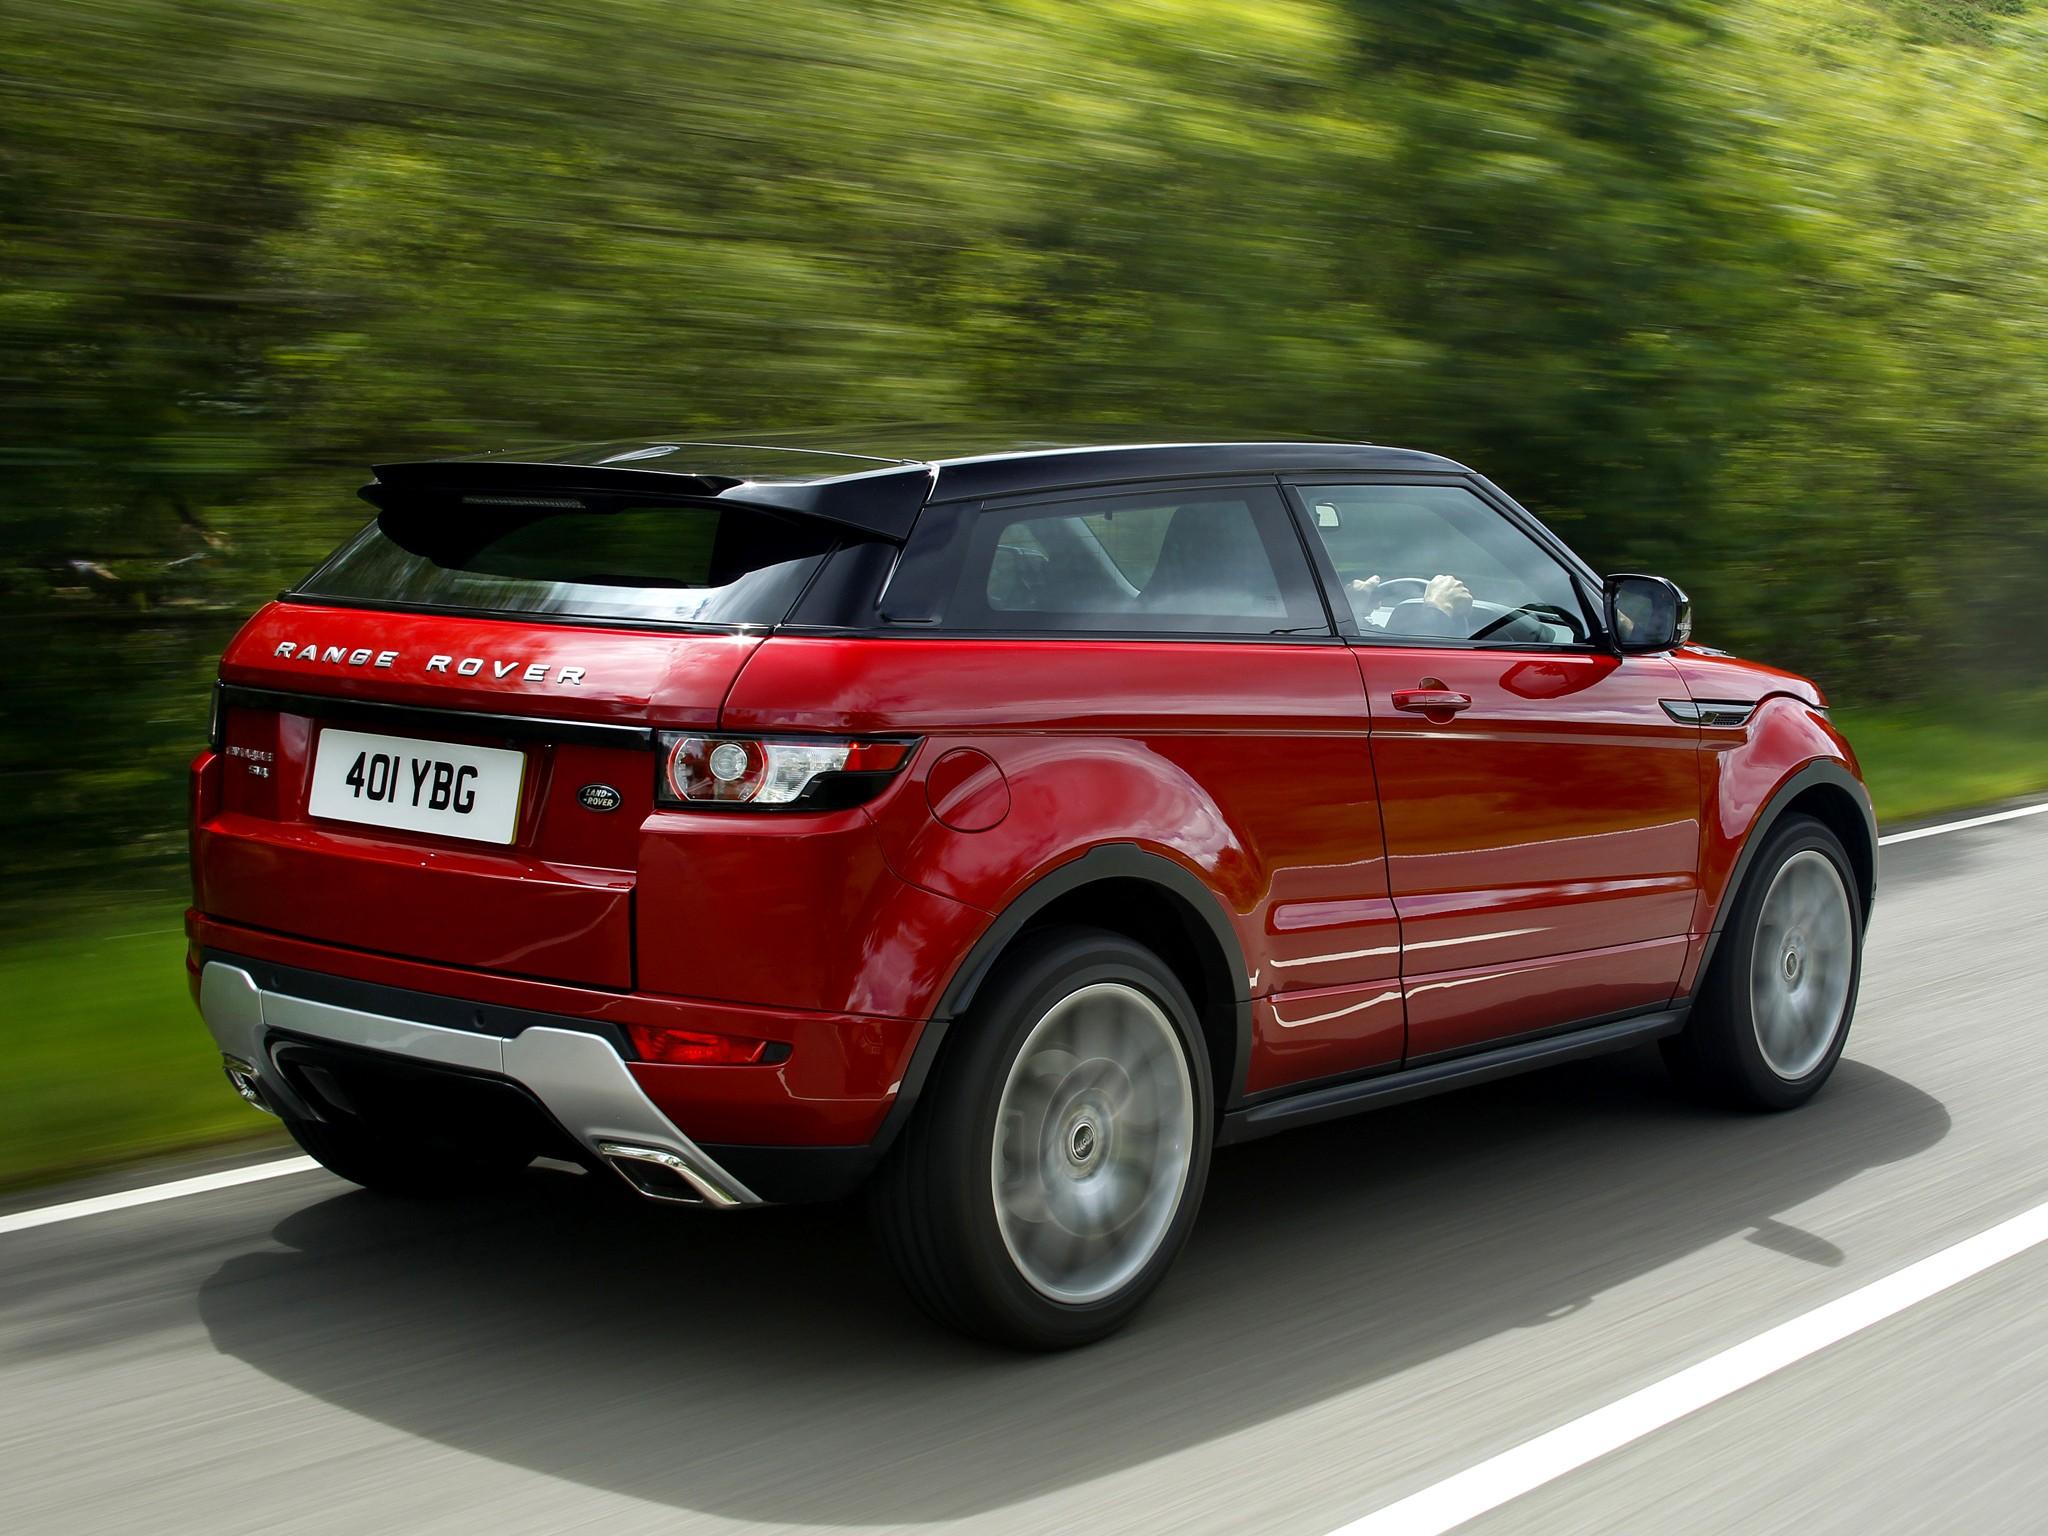 land rover range rover evoque coupe 2011 2012 2013 2014 2015 autoevolution. Black Bedroom Furniture Sets. Home Design Ideas